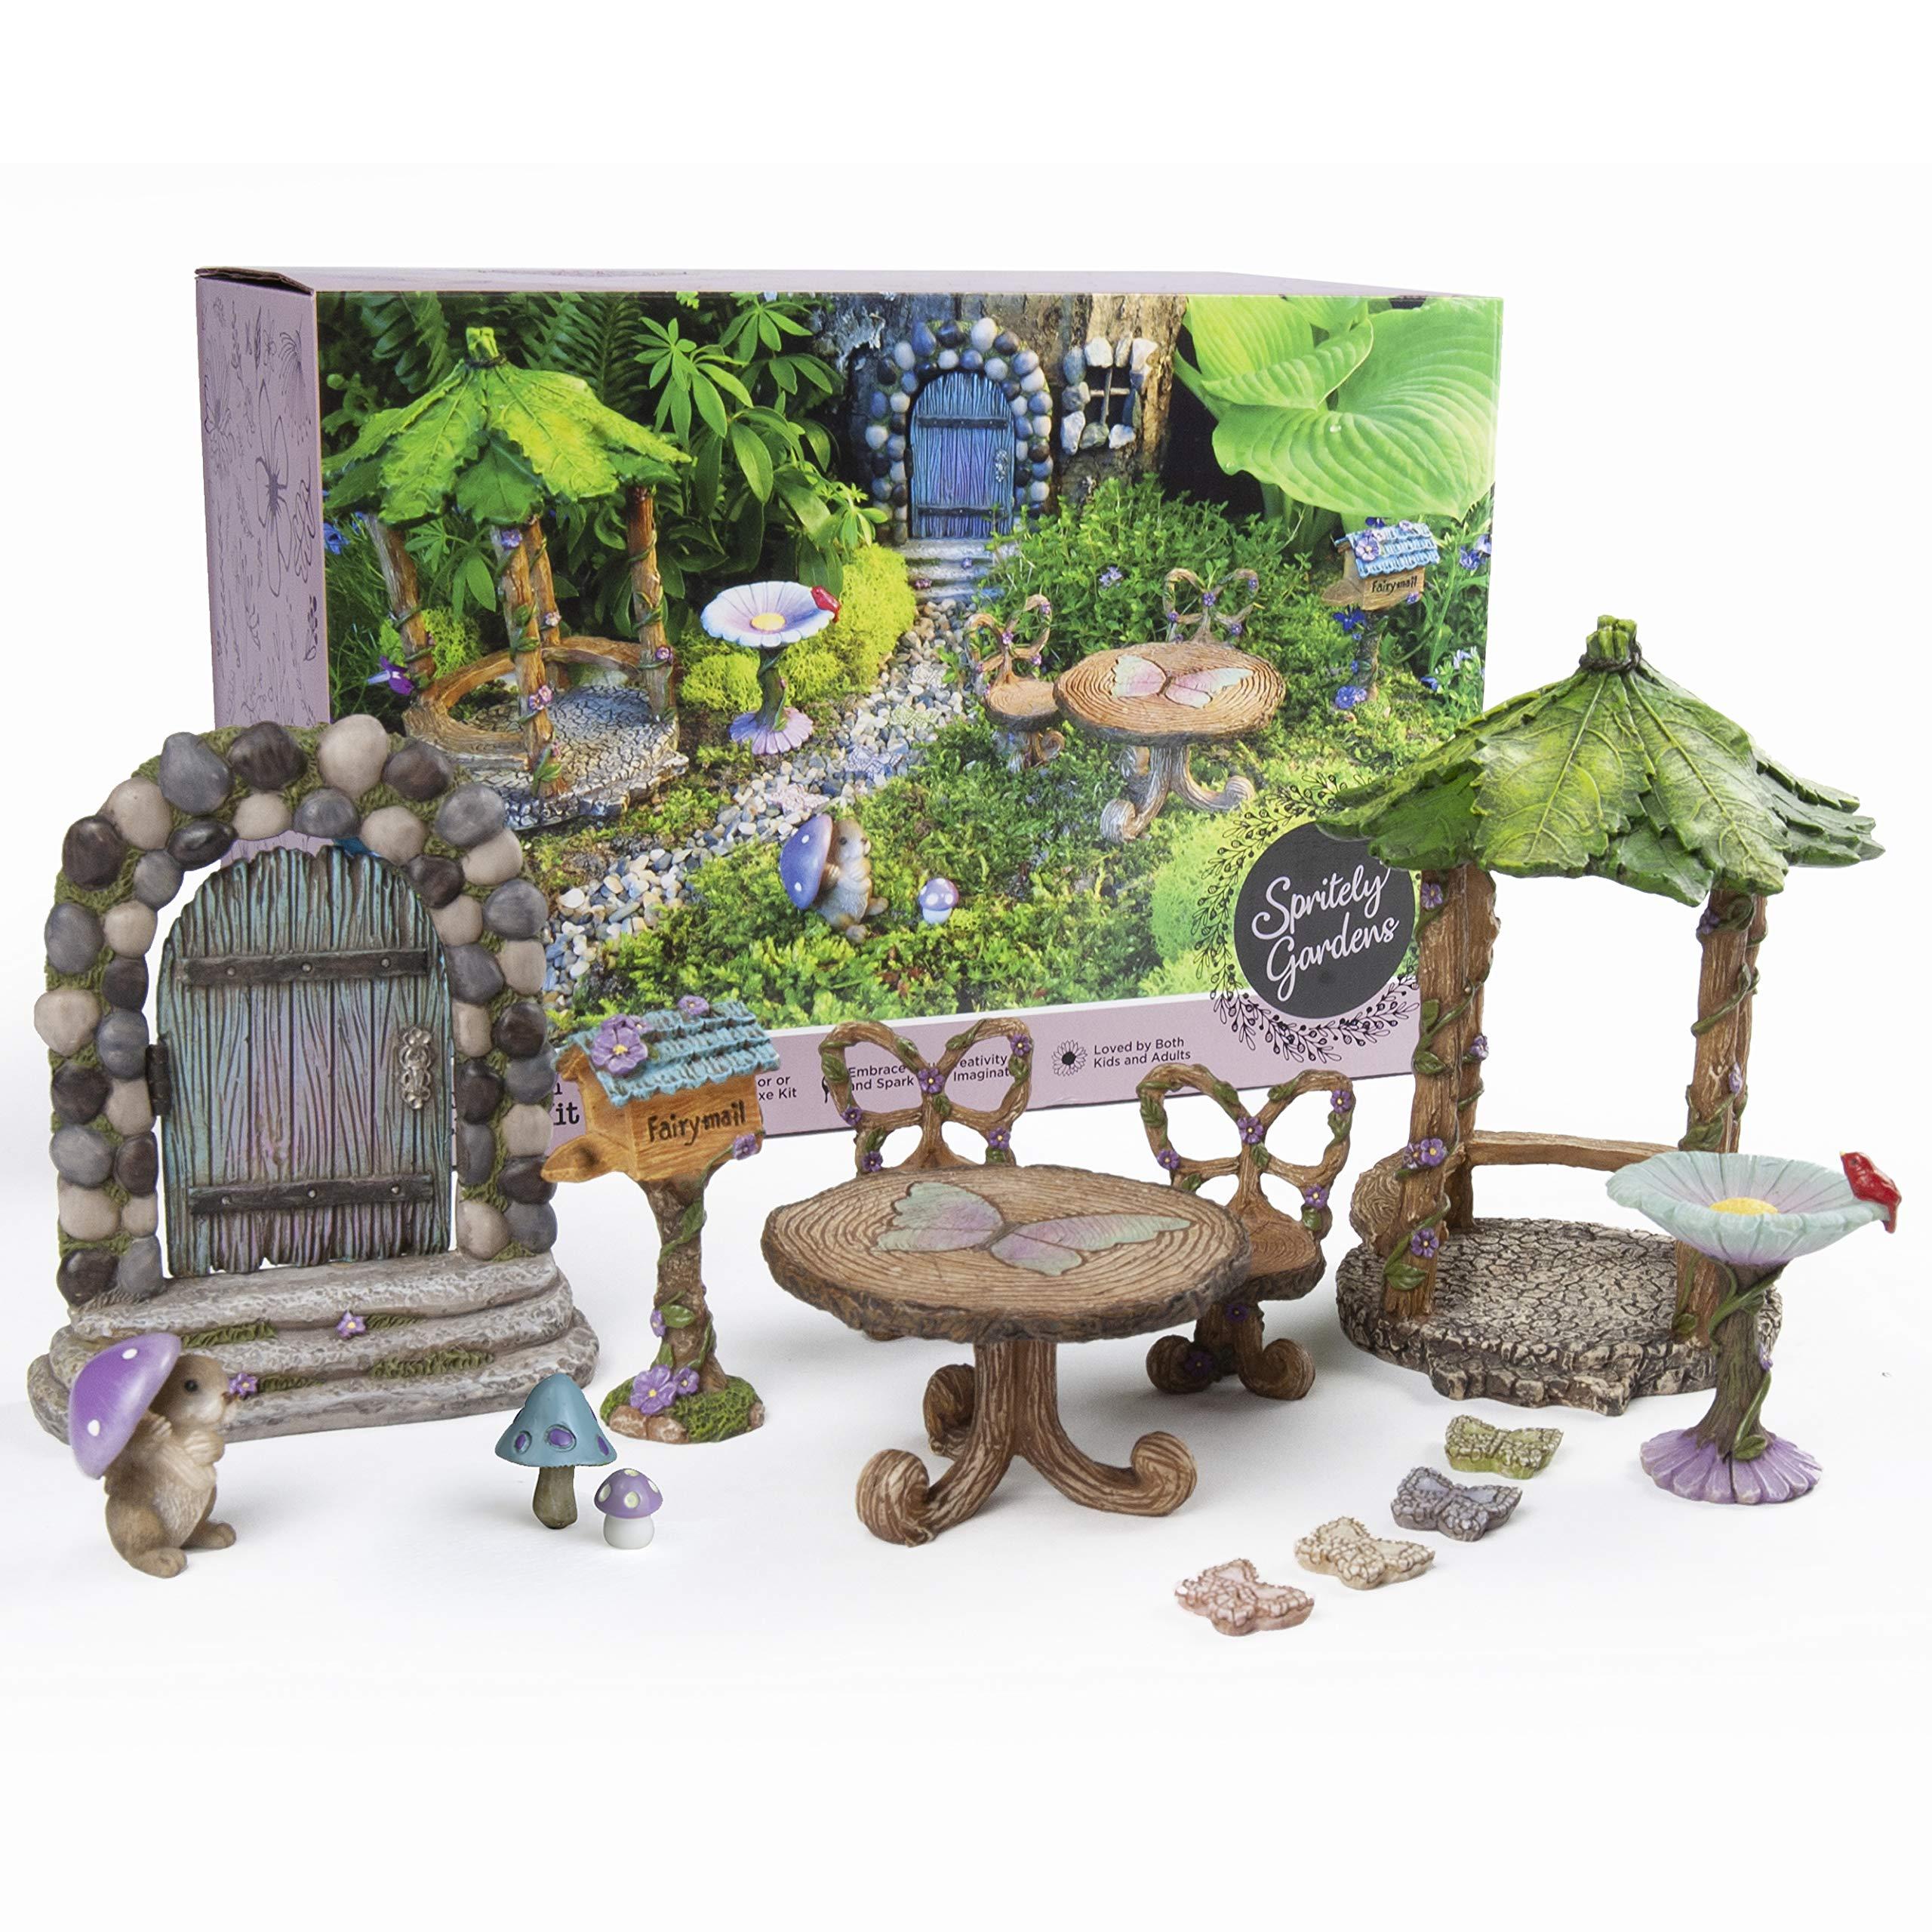 Spritely Gardens Deluxe Fairy Garden Kit with Accessories Indoor/Outdoor 14-Piece Toy Fairy Garden Miniatures - Fairy Garden Decorations Set Makes a Great Gift for Girls